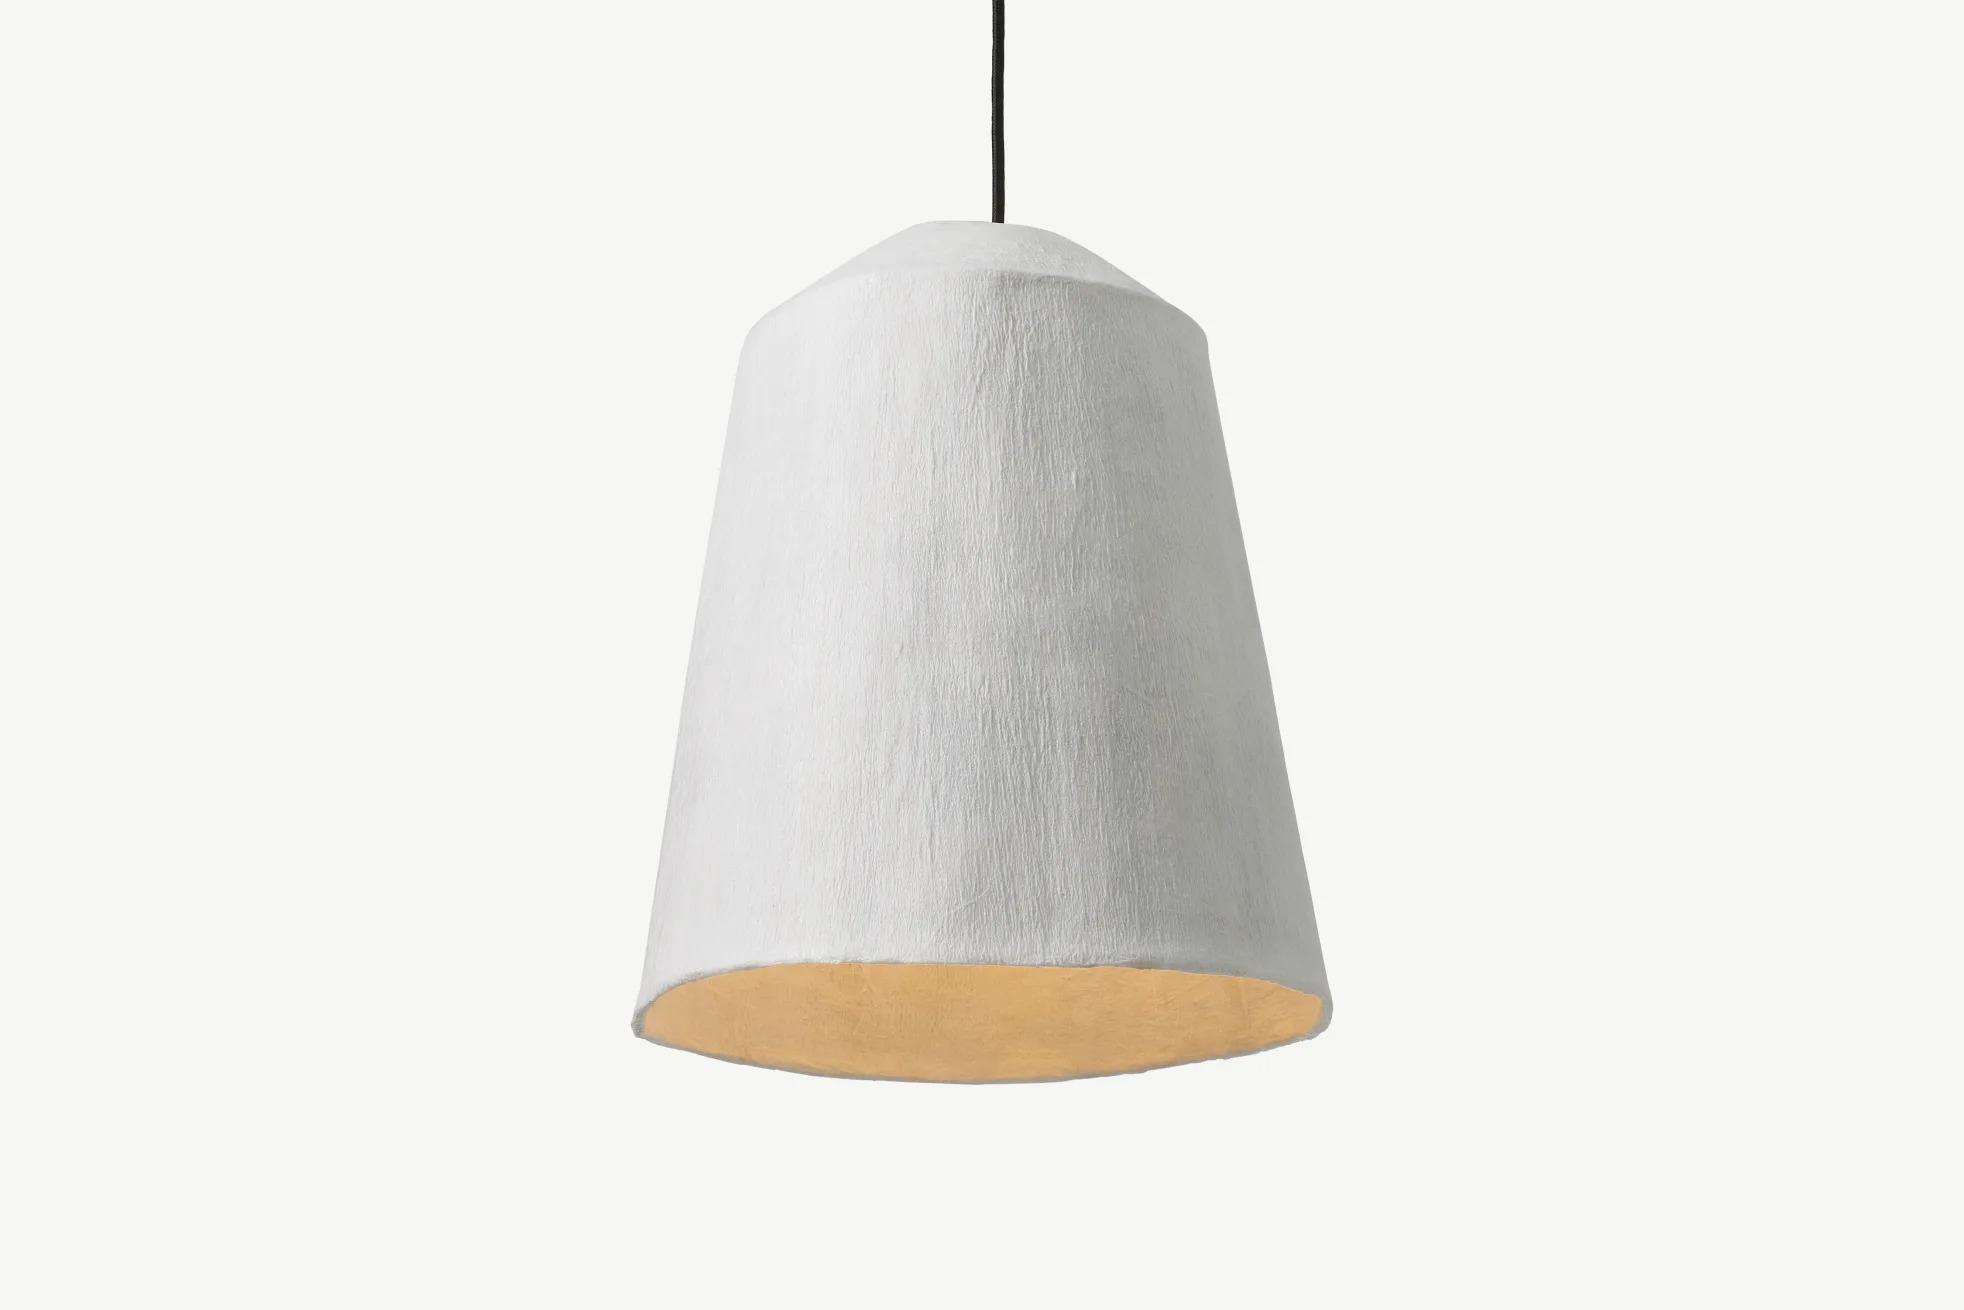 Dahlia Pantalla de lámpara alta Dahlia, papel maché blanco